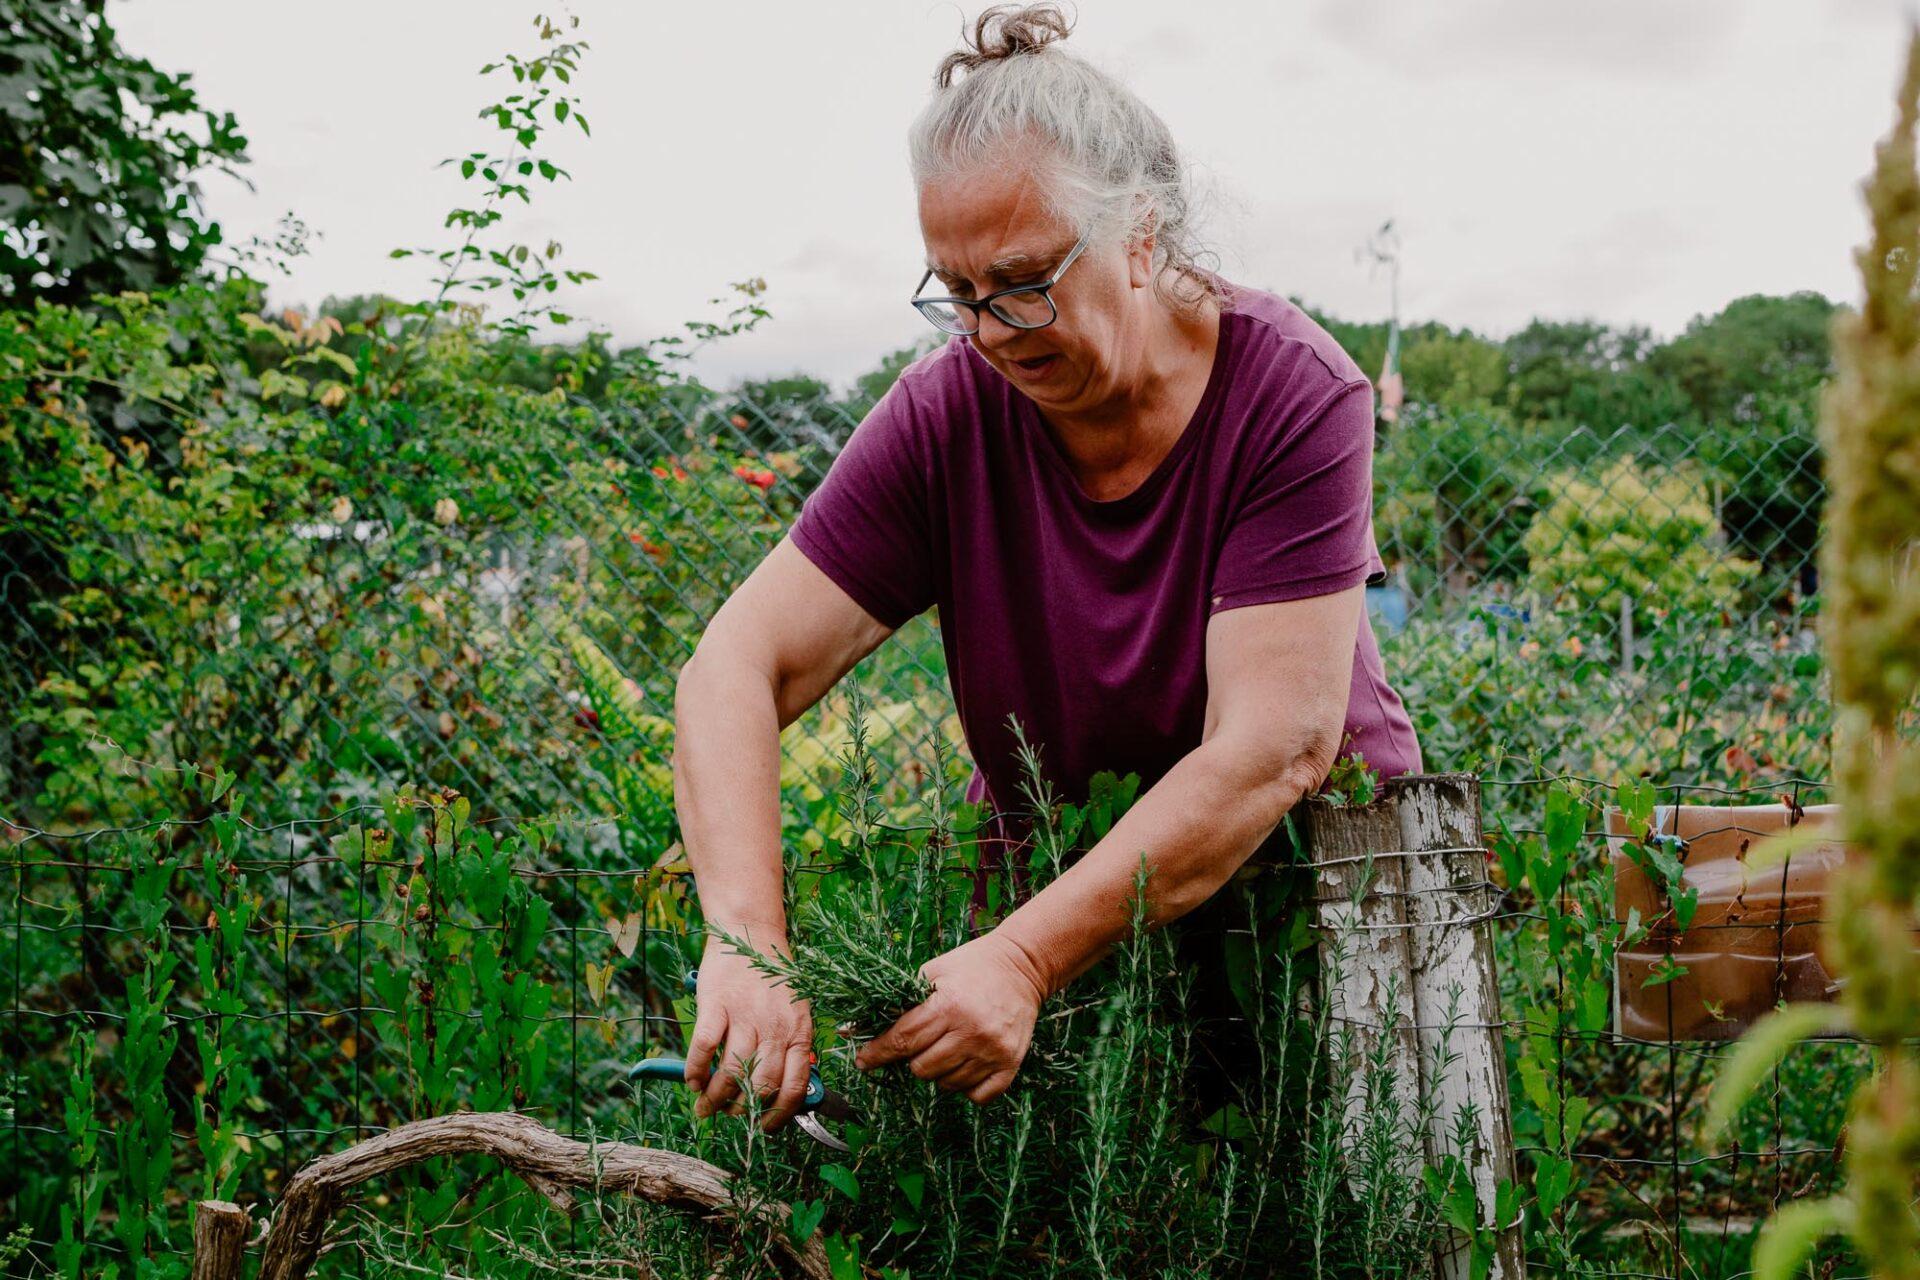 Jardins ouvriers aubervilliers 48 - Dagmara Bojenko - Eco-conscious Weddings, Births & Families